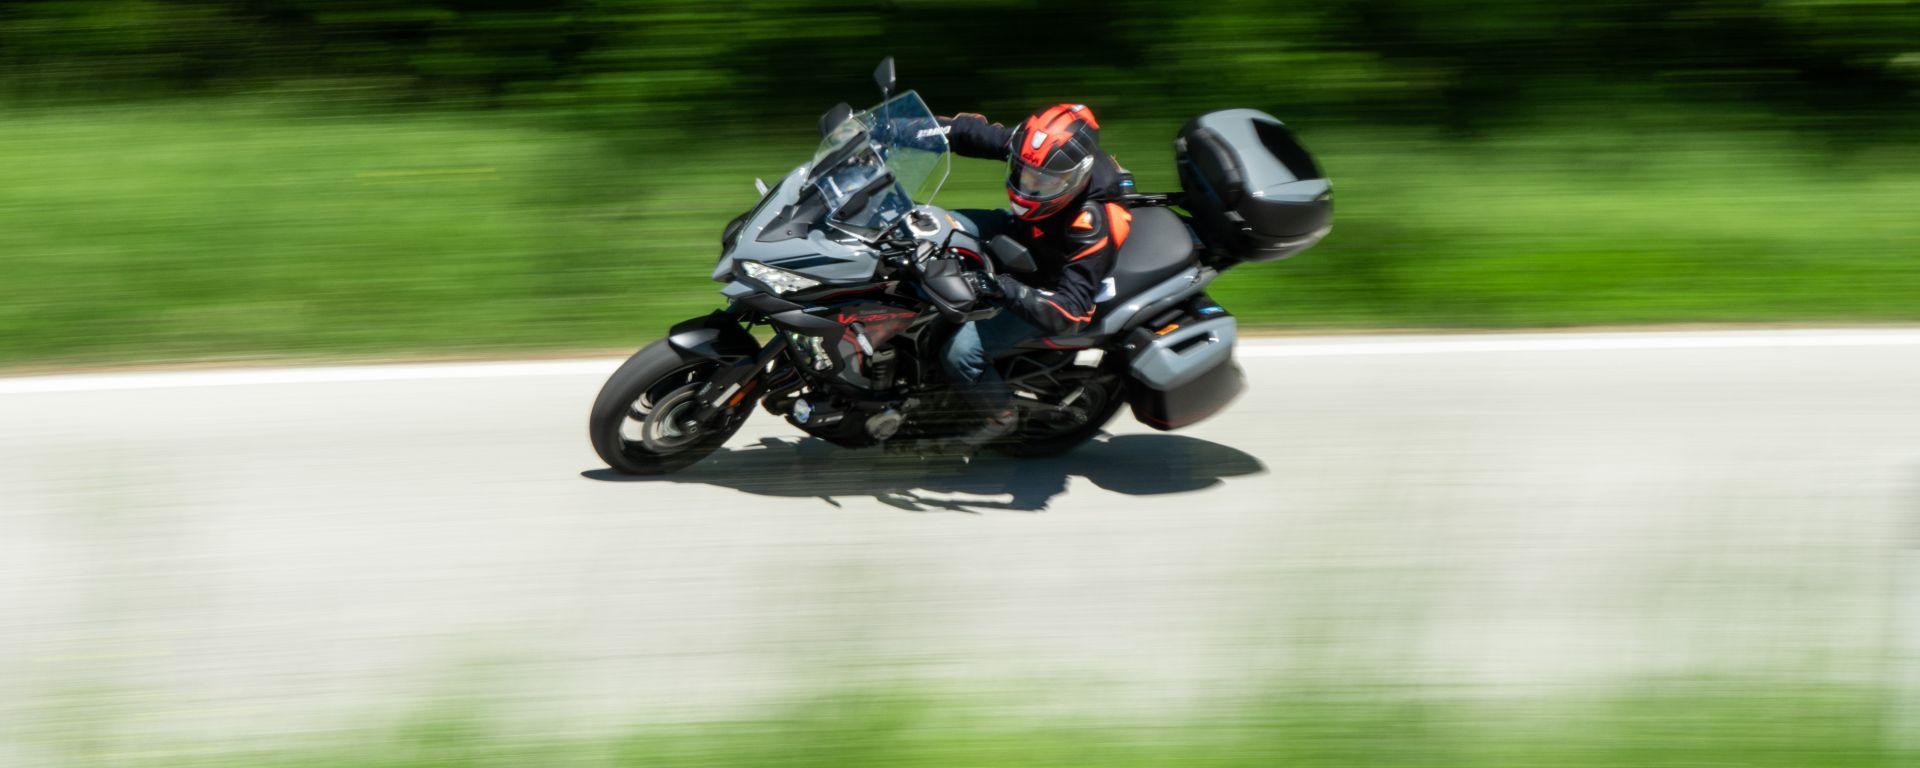 Kawasaki Versys 1000 S Grand Tourer 2021 in piega